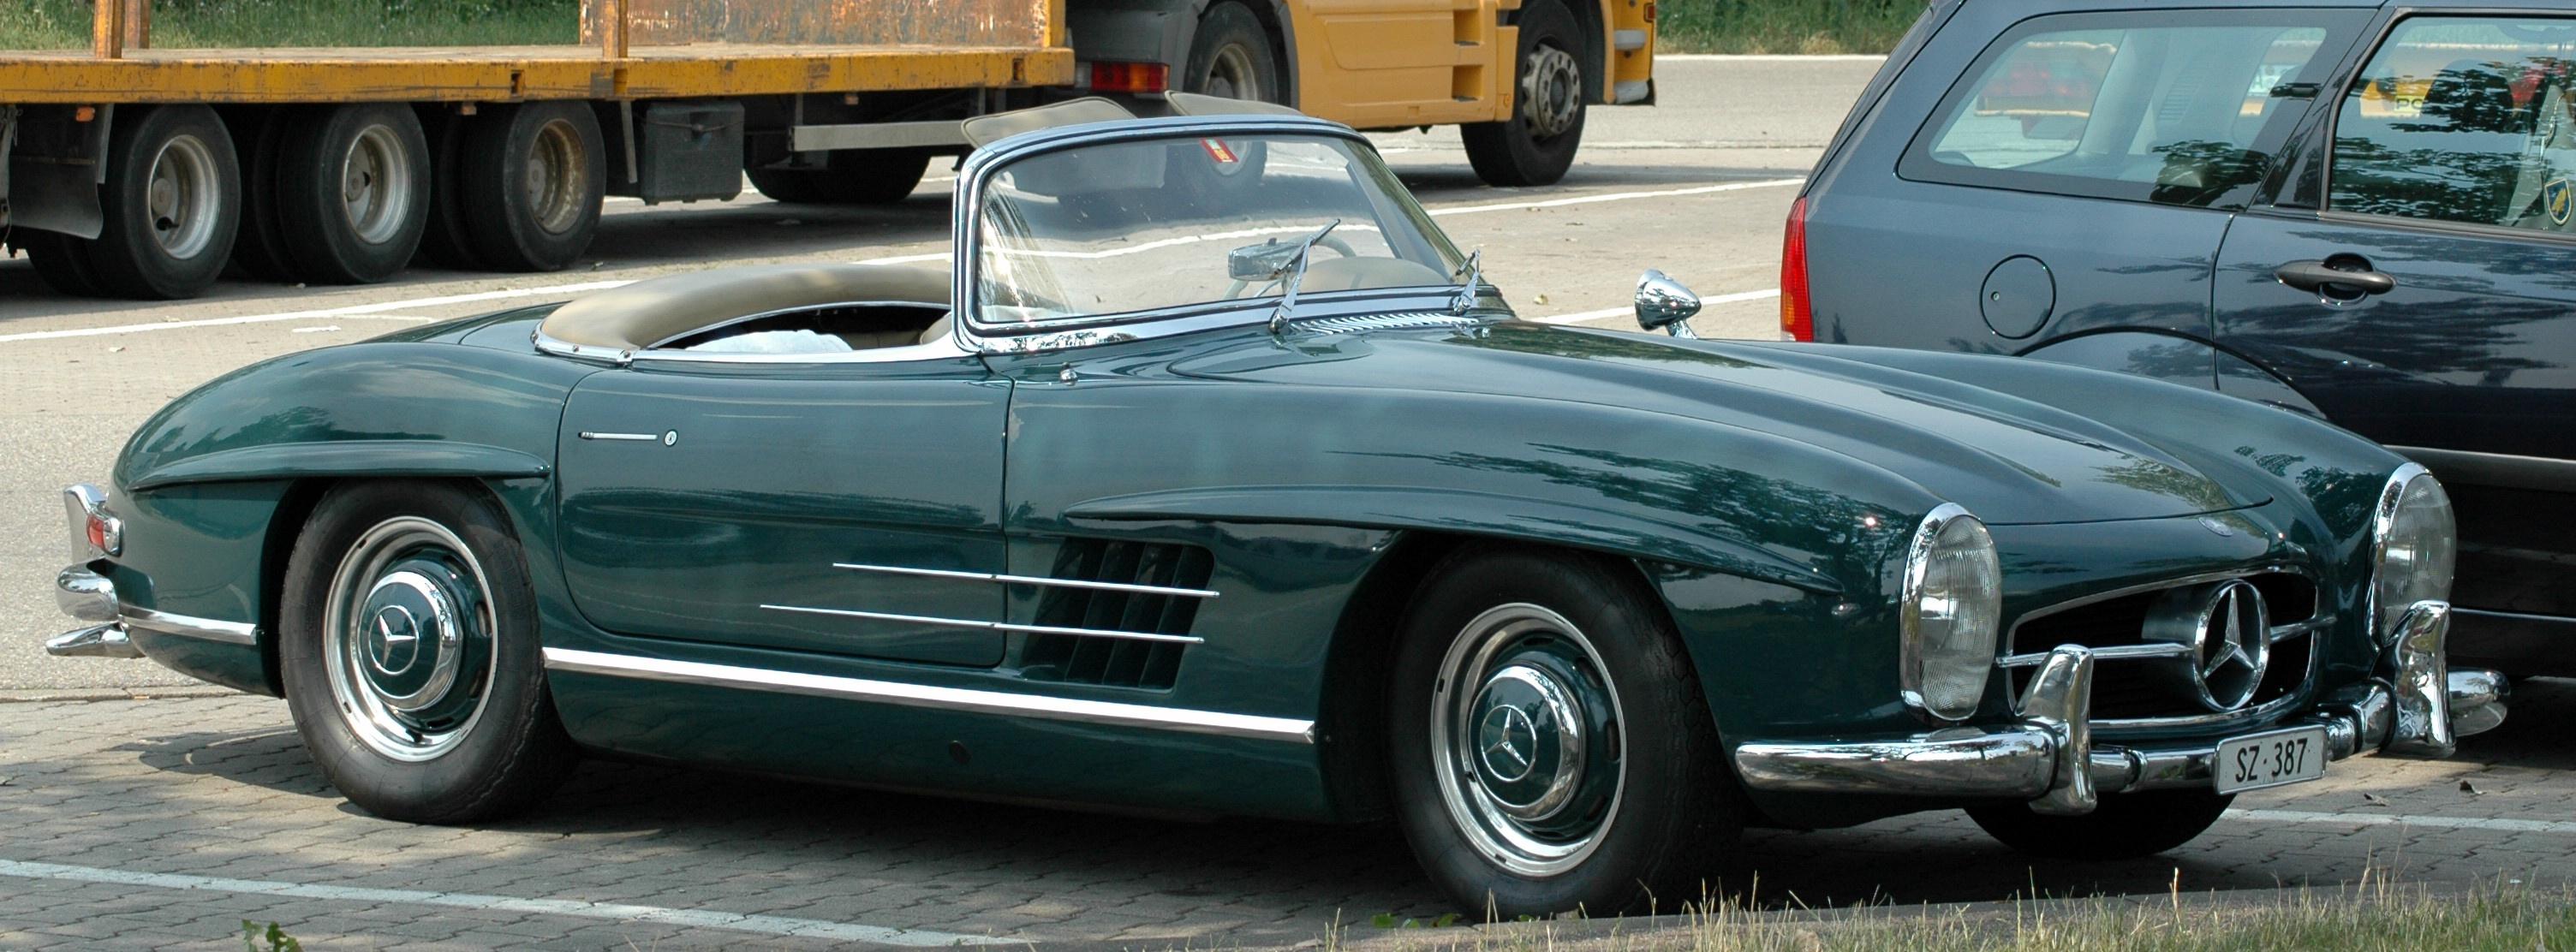 Megapost autos que me gustaria tener y de seguro a ti for Mercedes benz 300s